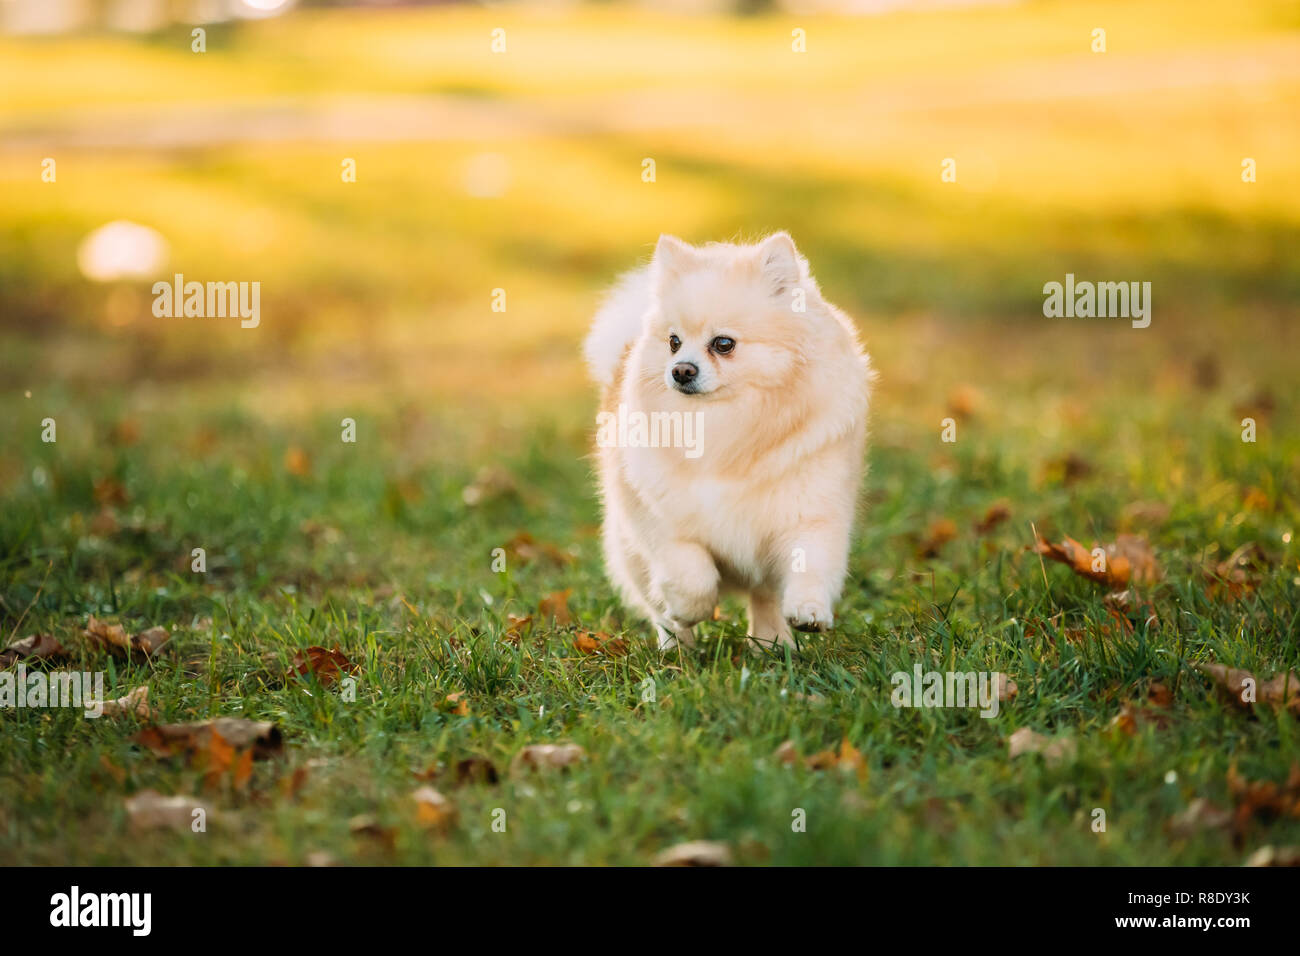 Adult White Pomeranian Spitz Dog Walking Outdoor In Autumn Grass